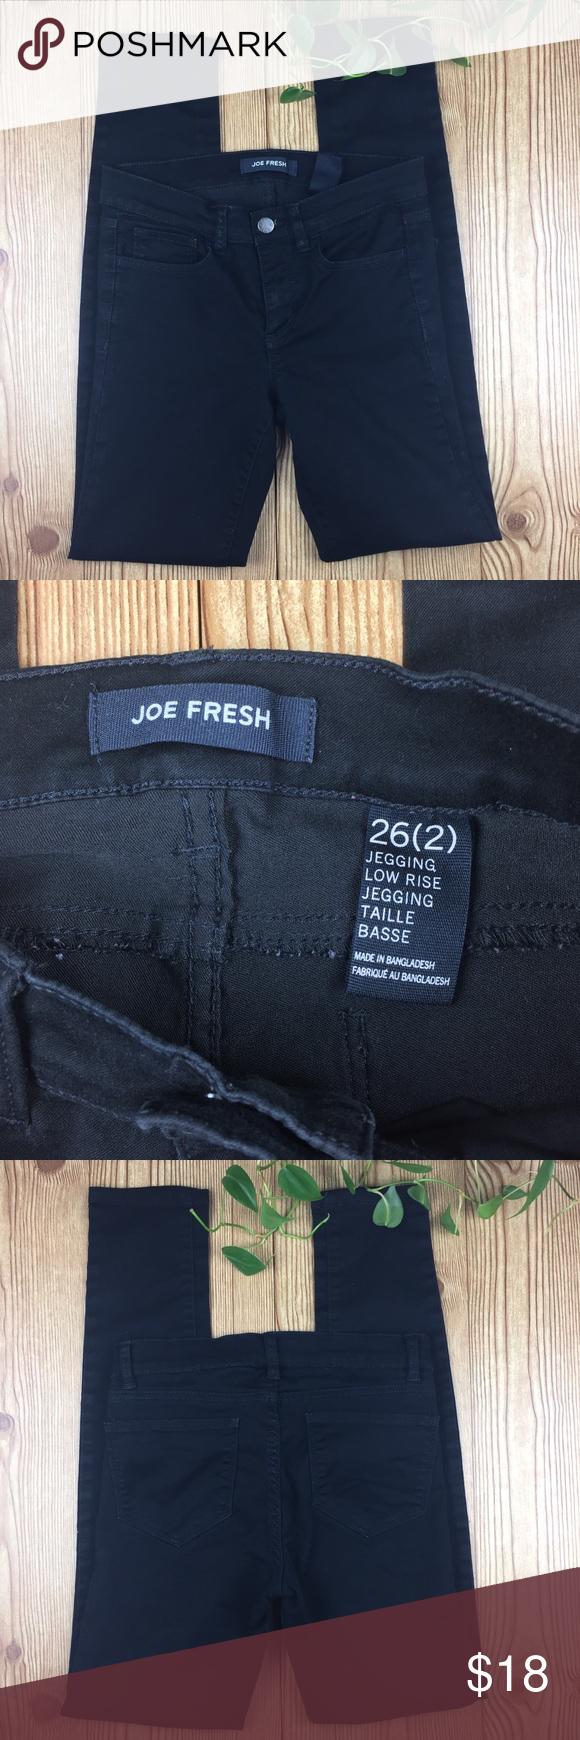 1cb8522d16c6a Joe Fresh Black Jeggings | Size 2 Excellent condition, stretchy Joe Fresh  Jeggings Size 26 (2) Joe Fresh Pants Leggings